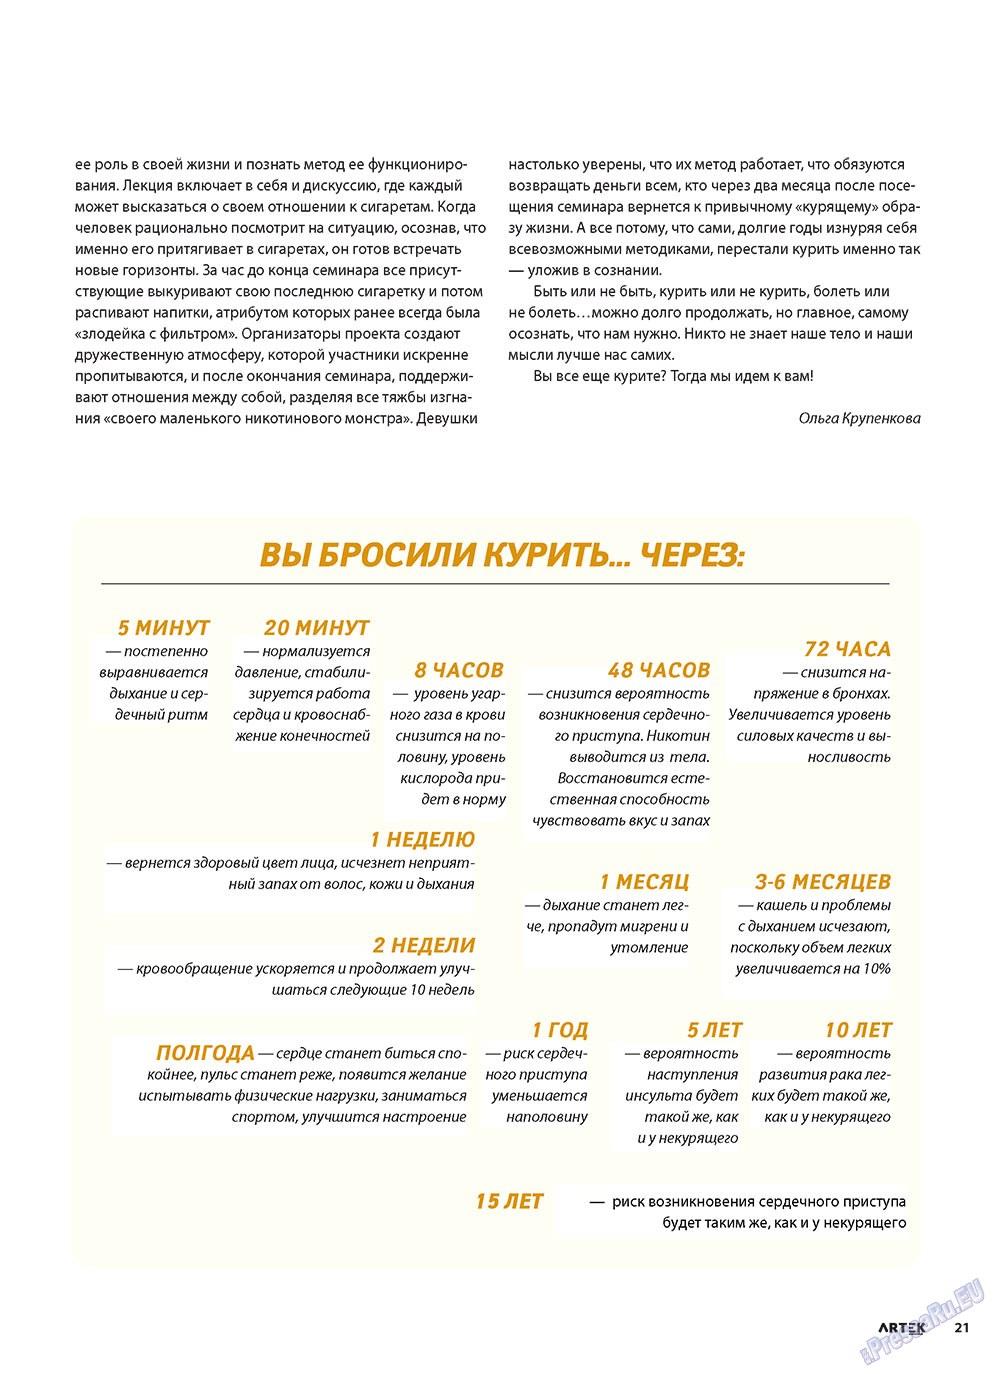 Артек (журнал). 2011 год, номер 2, стр. 23